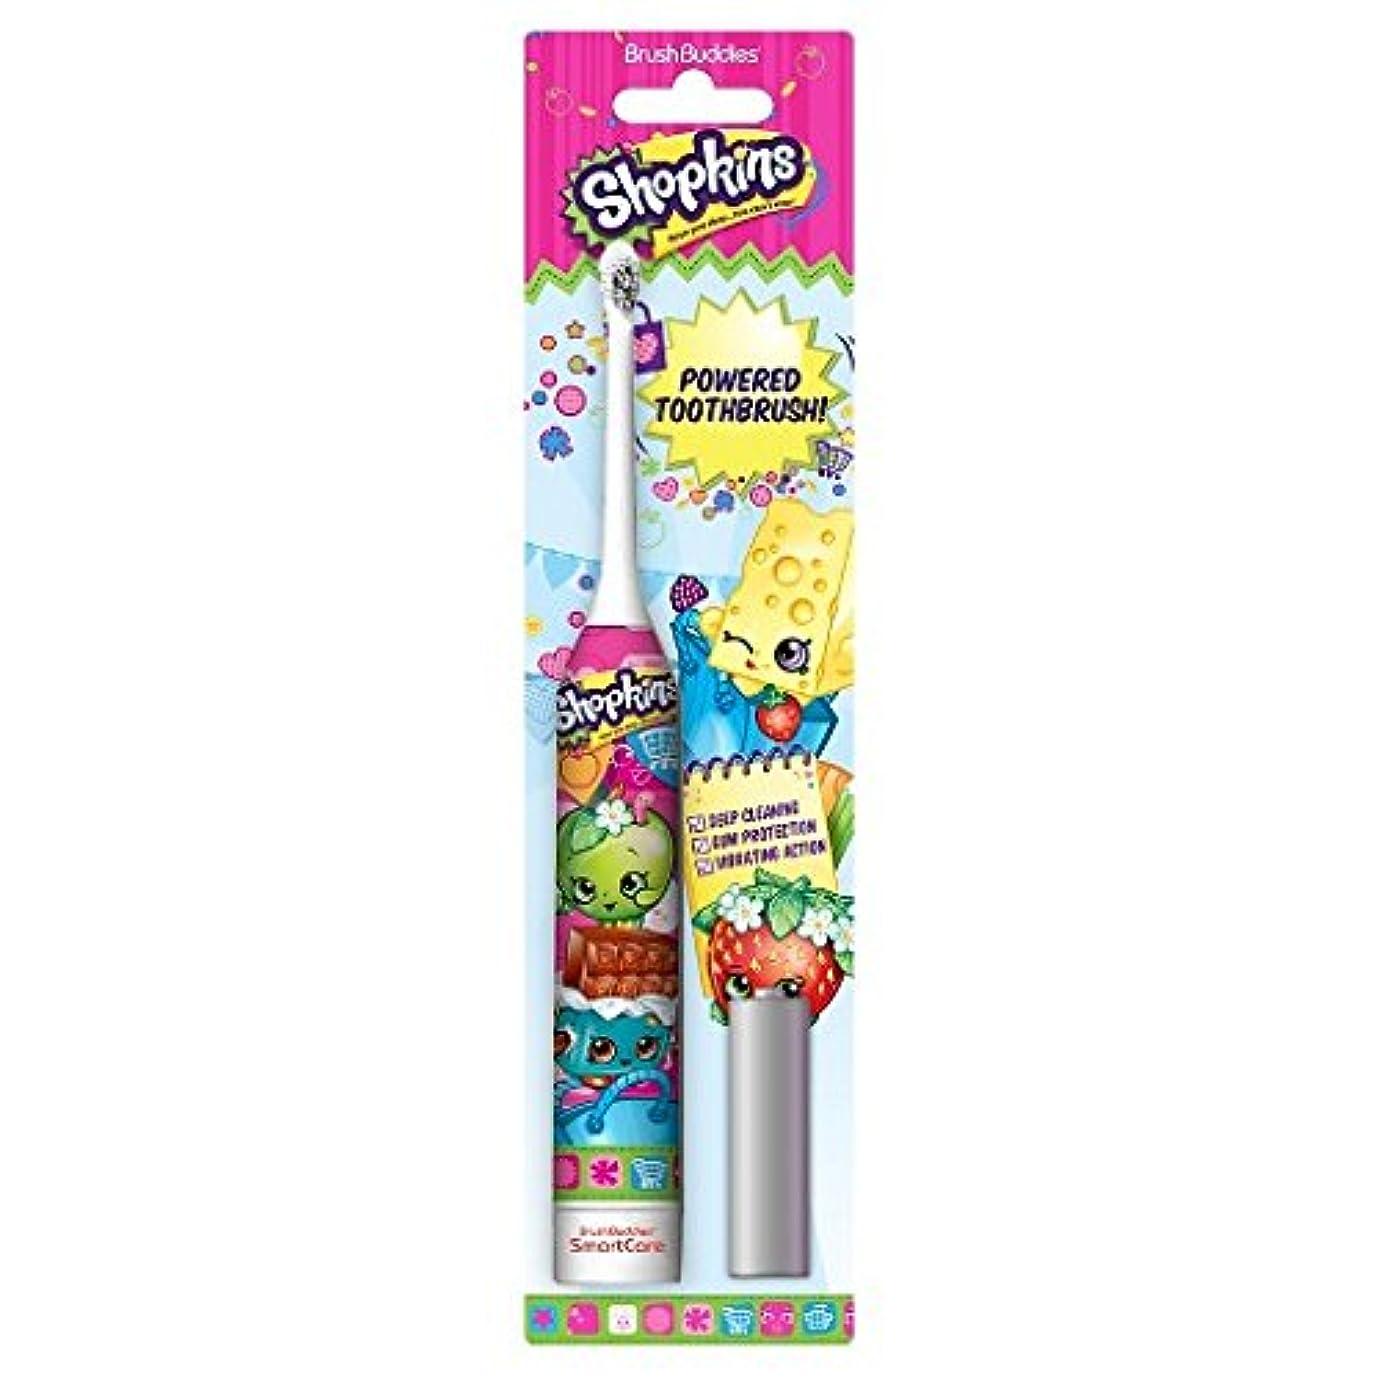 Brush Buddies Shopkins Sonic Powered Toothbrush ソニックパワード電動歯ブラシ [並行輸入品]